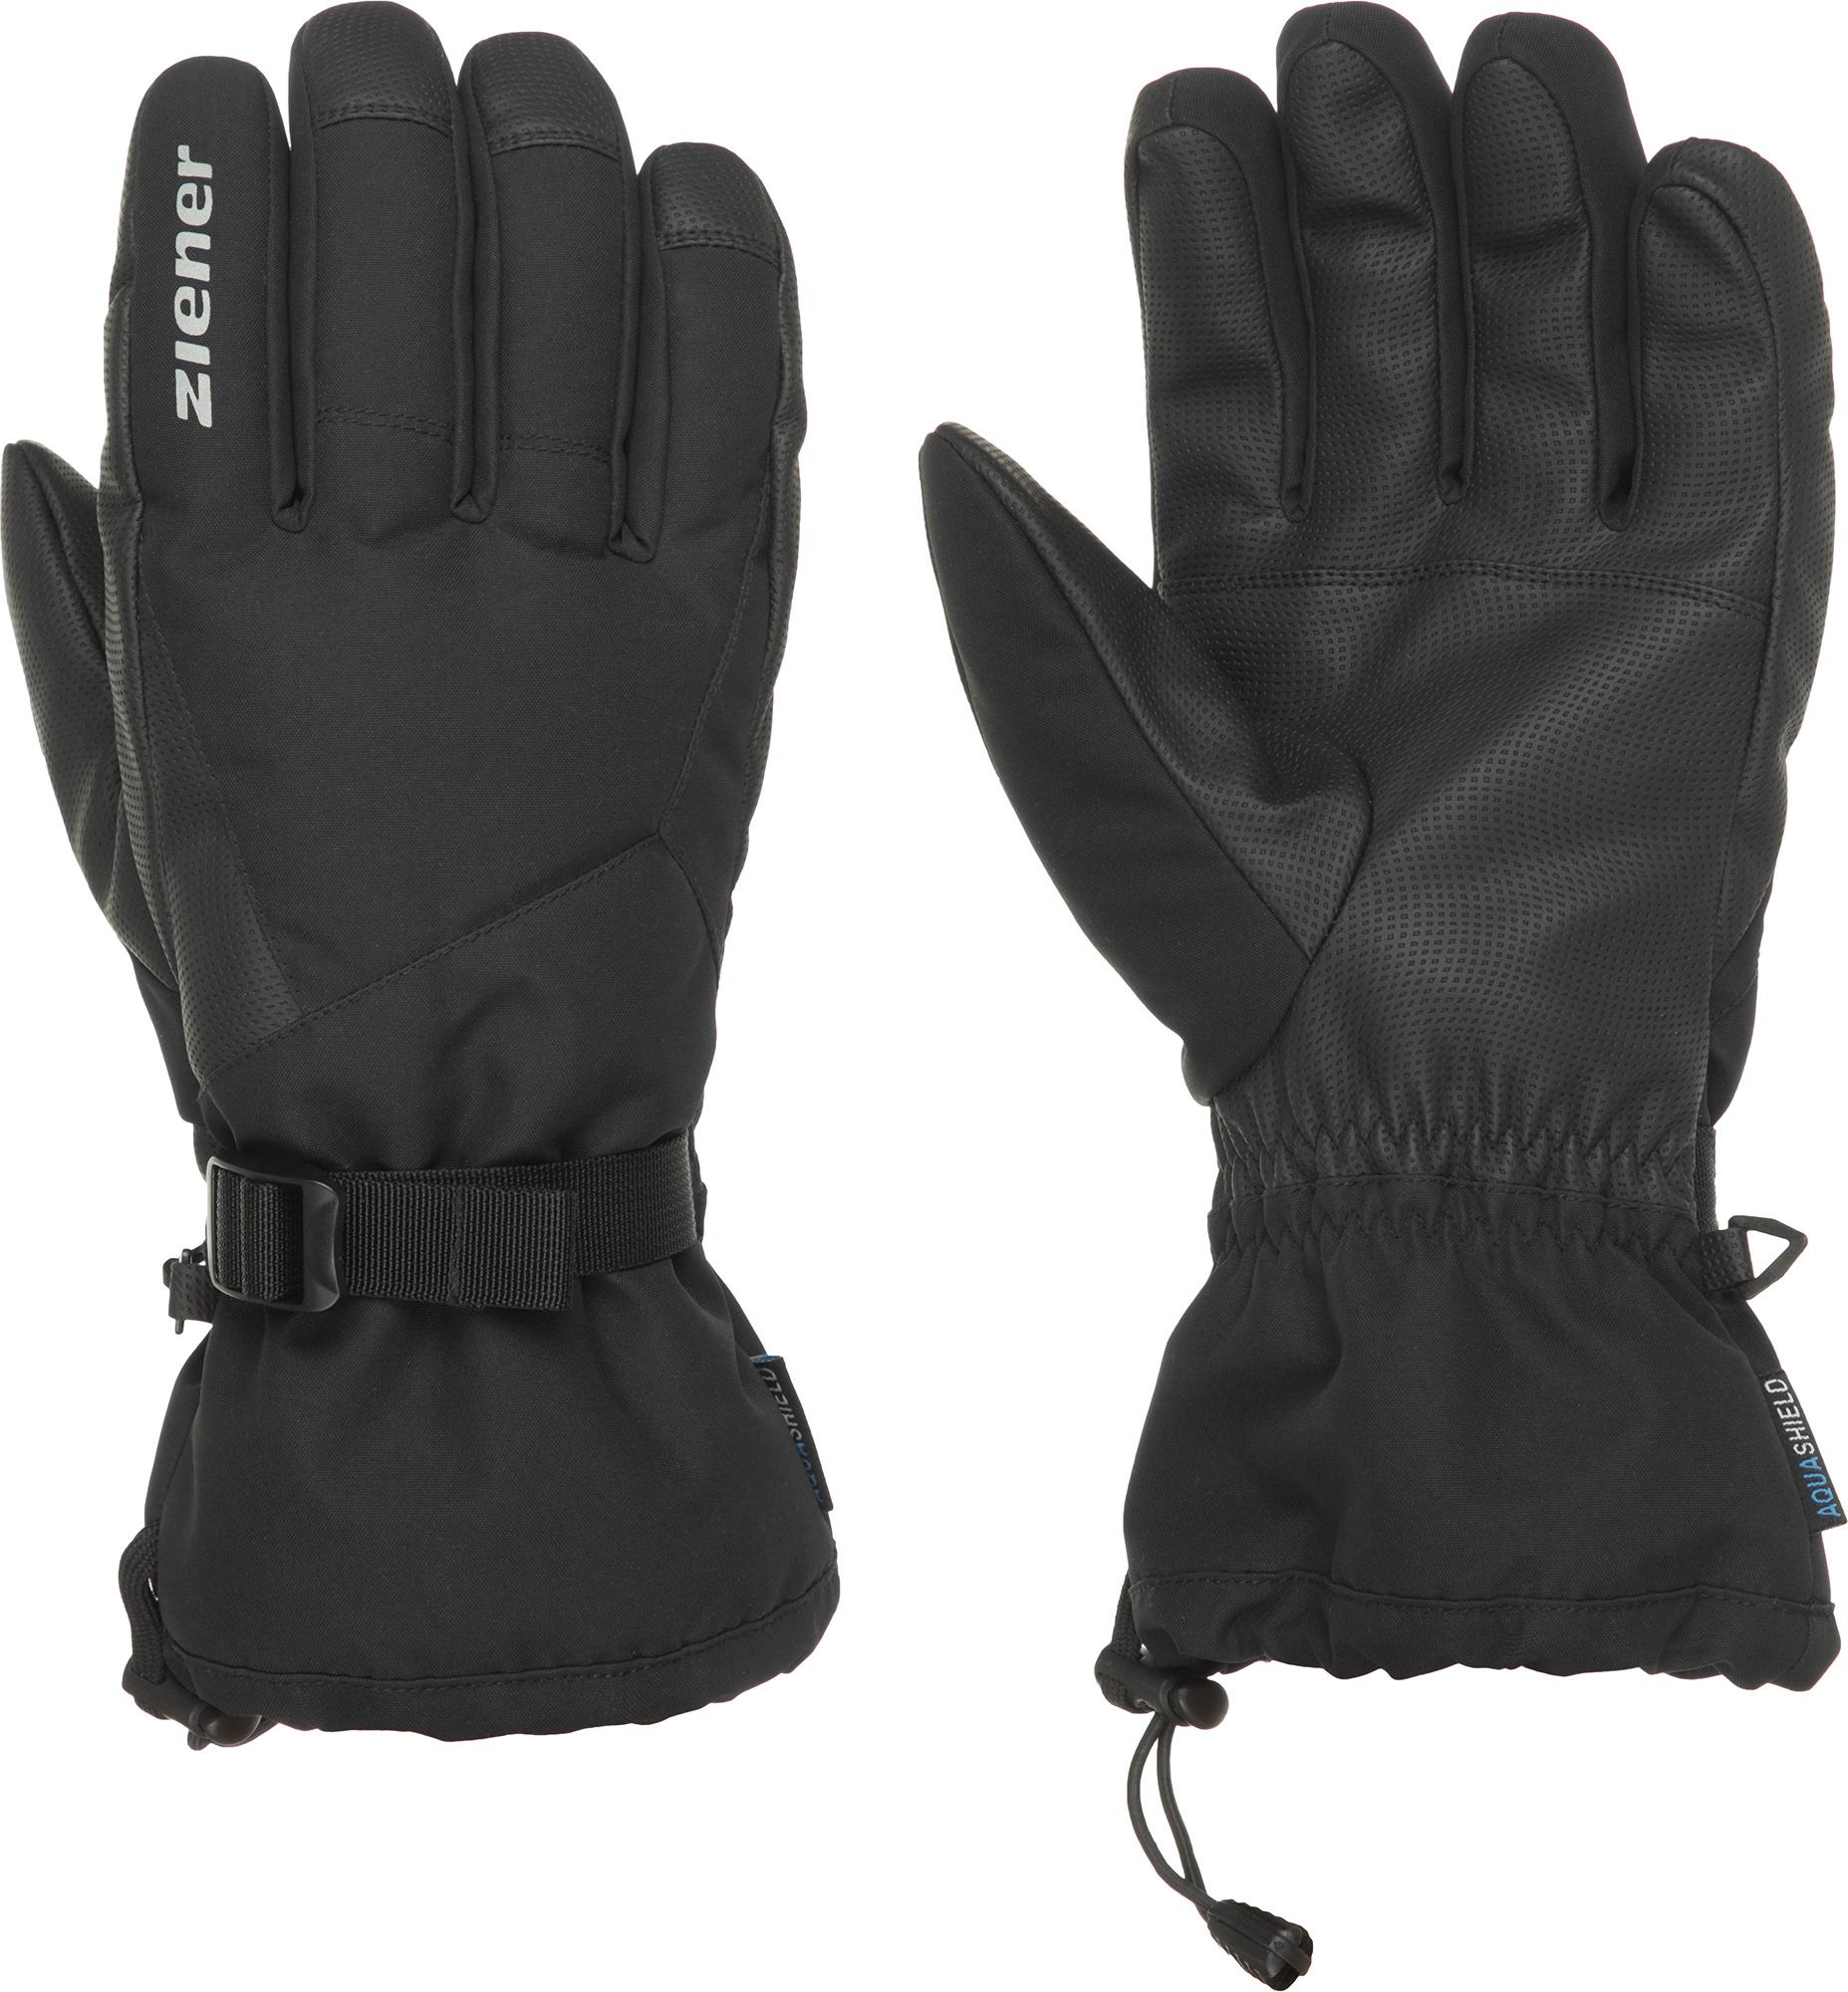 Ziener Перчатки мужские Ziener, размер 9,5 ziener перчатки мужские ziener gliss gtx размер 9